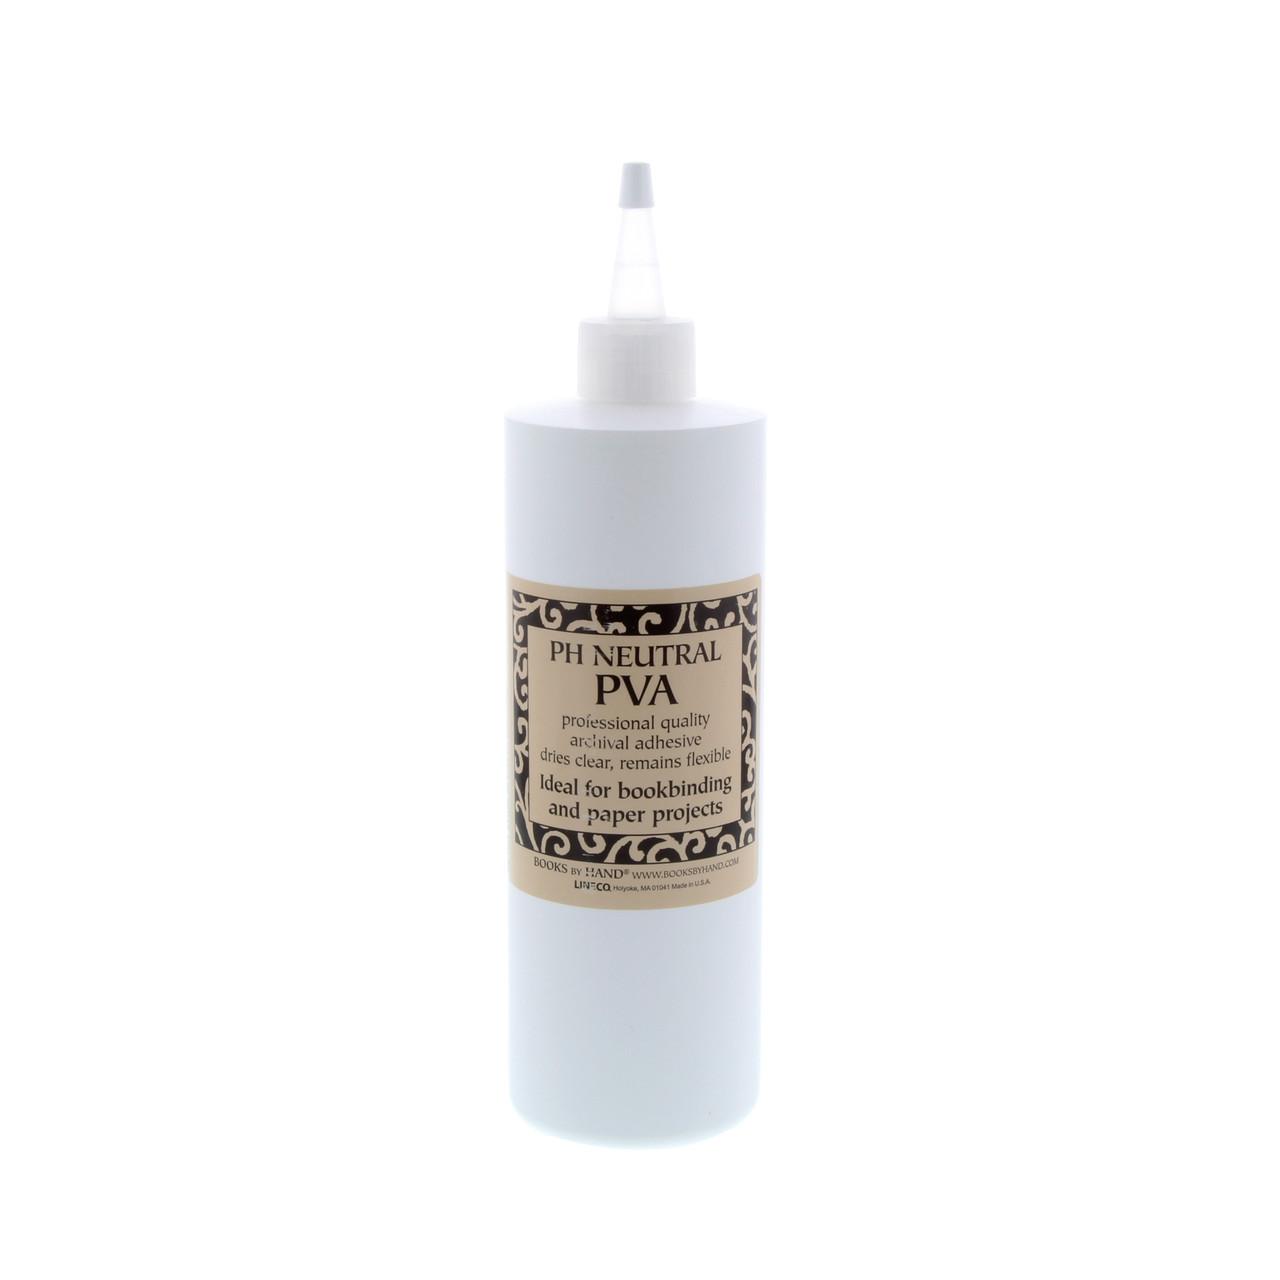 pH Neutral PVA Adhesive